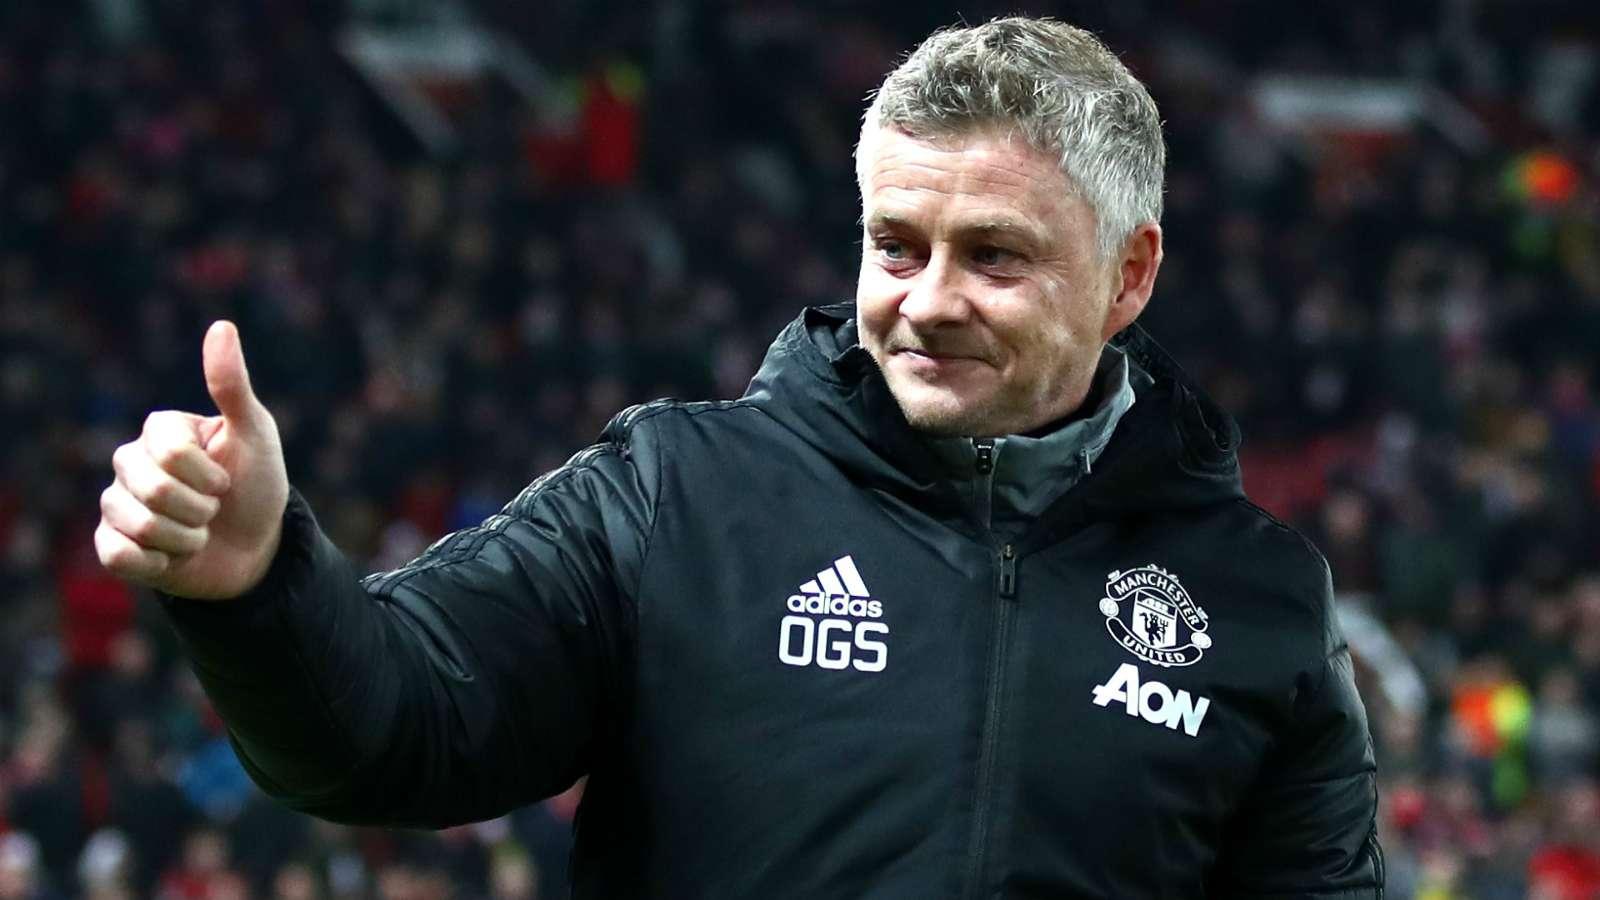 Manchester United 'want Aaron Ramsey in Paul Pogba deal' - Bóng Đá